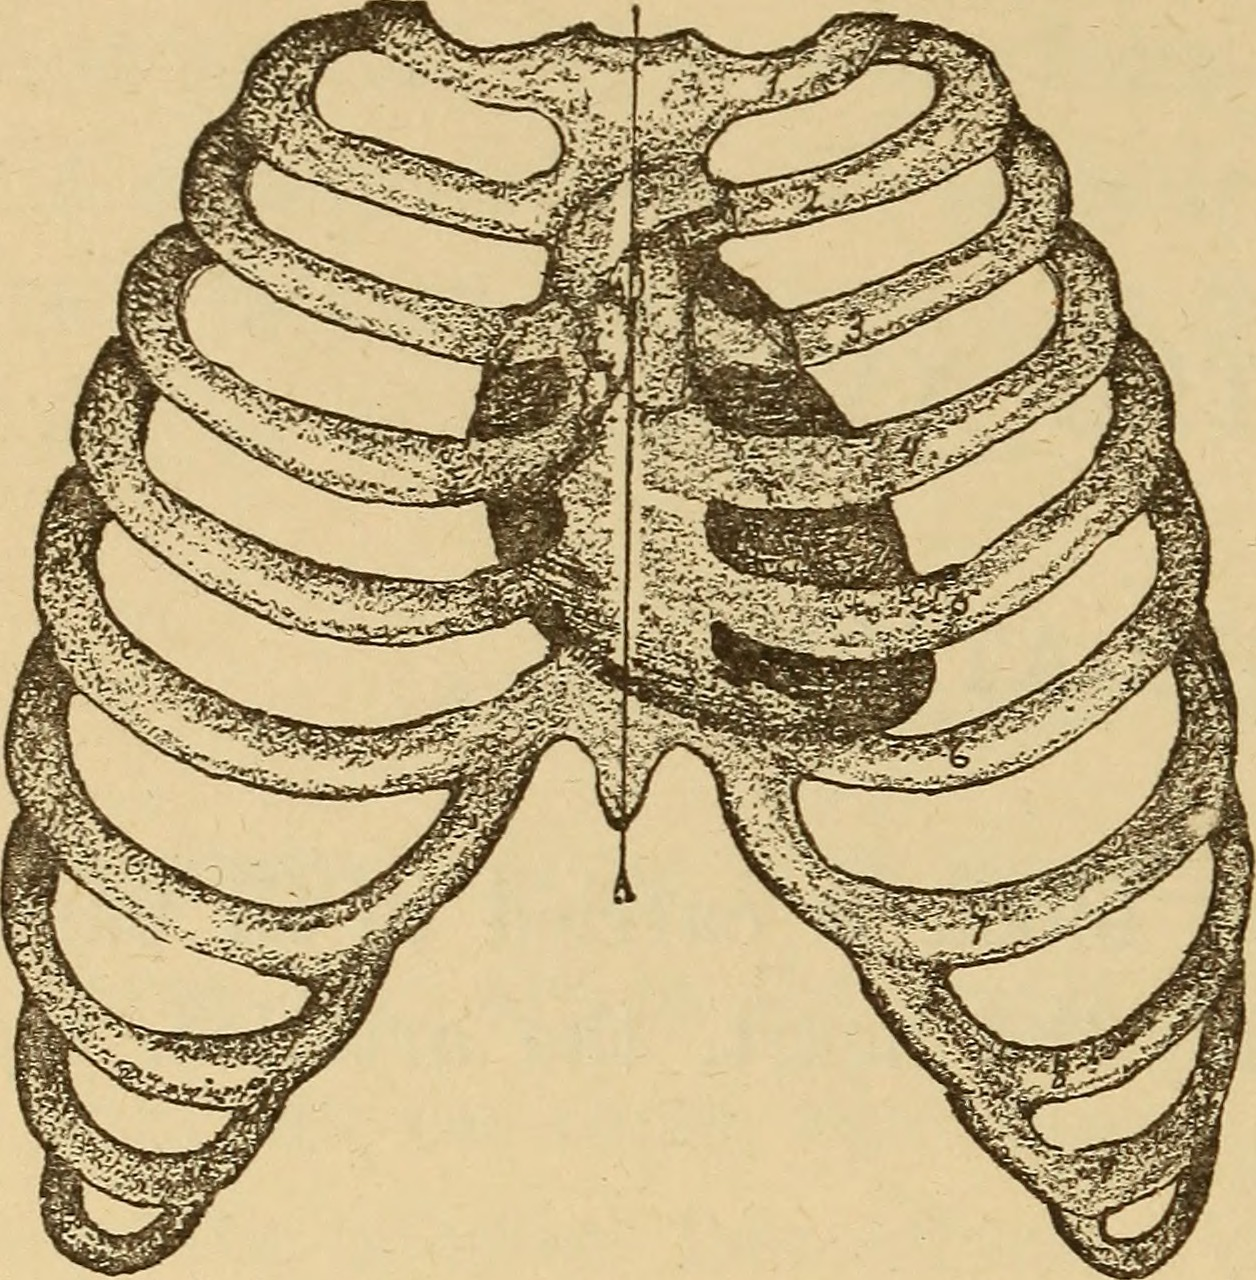 File:A healthy body. A textbook on anatomy, physiology, hygiene ...